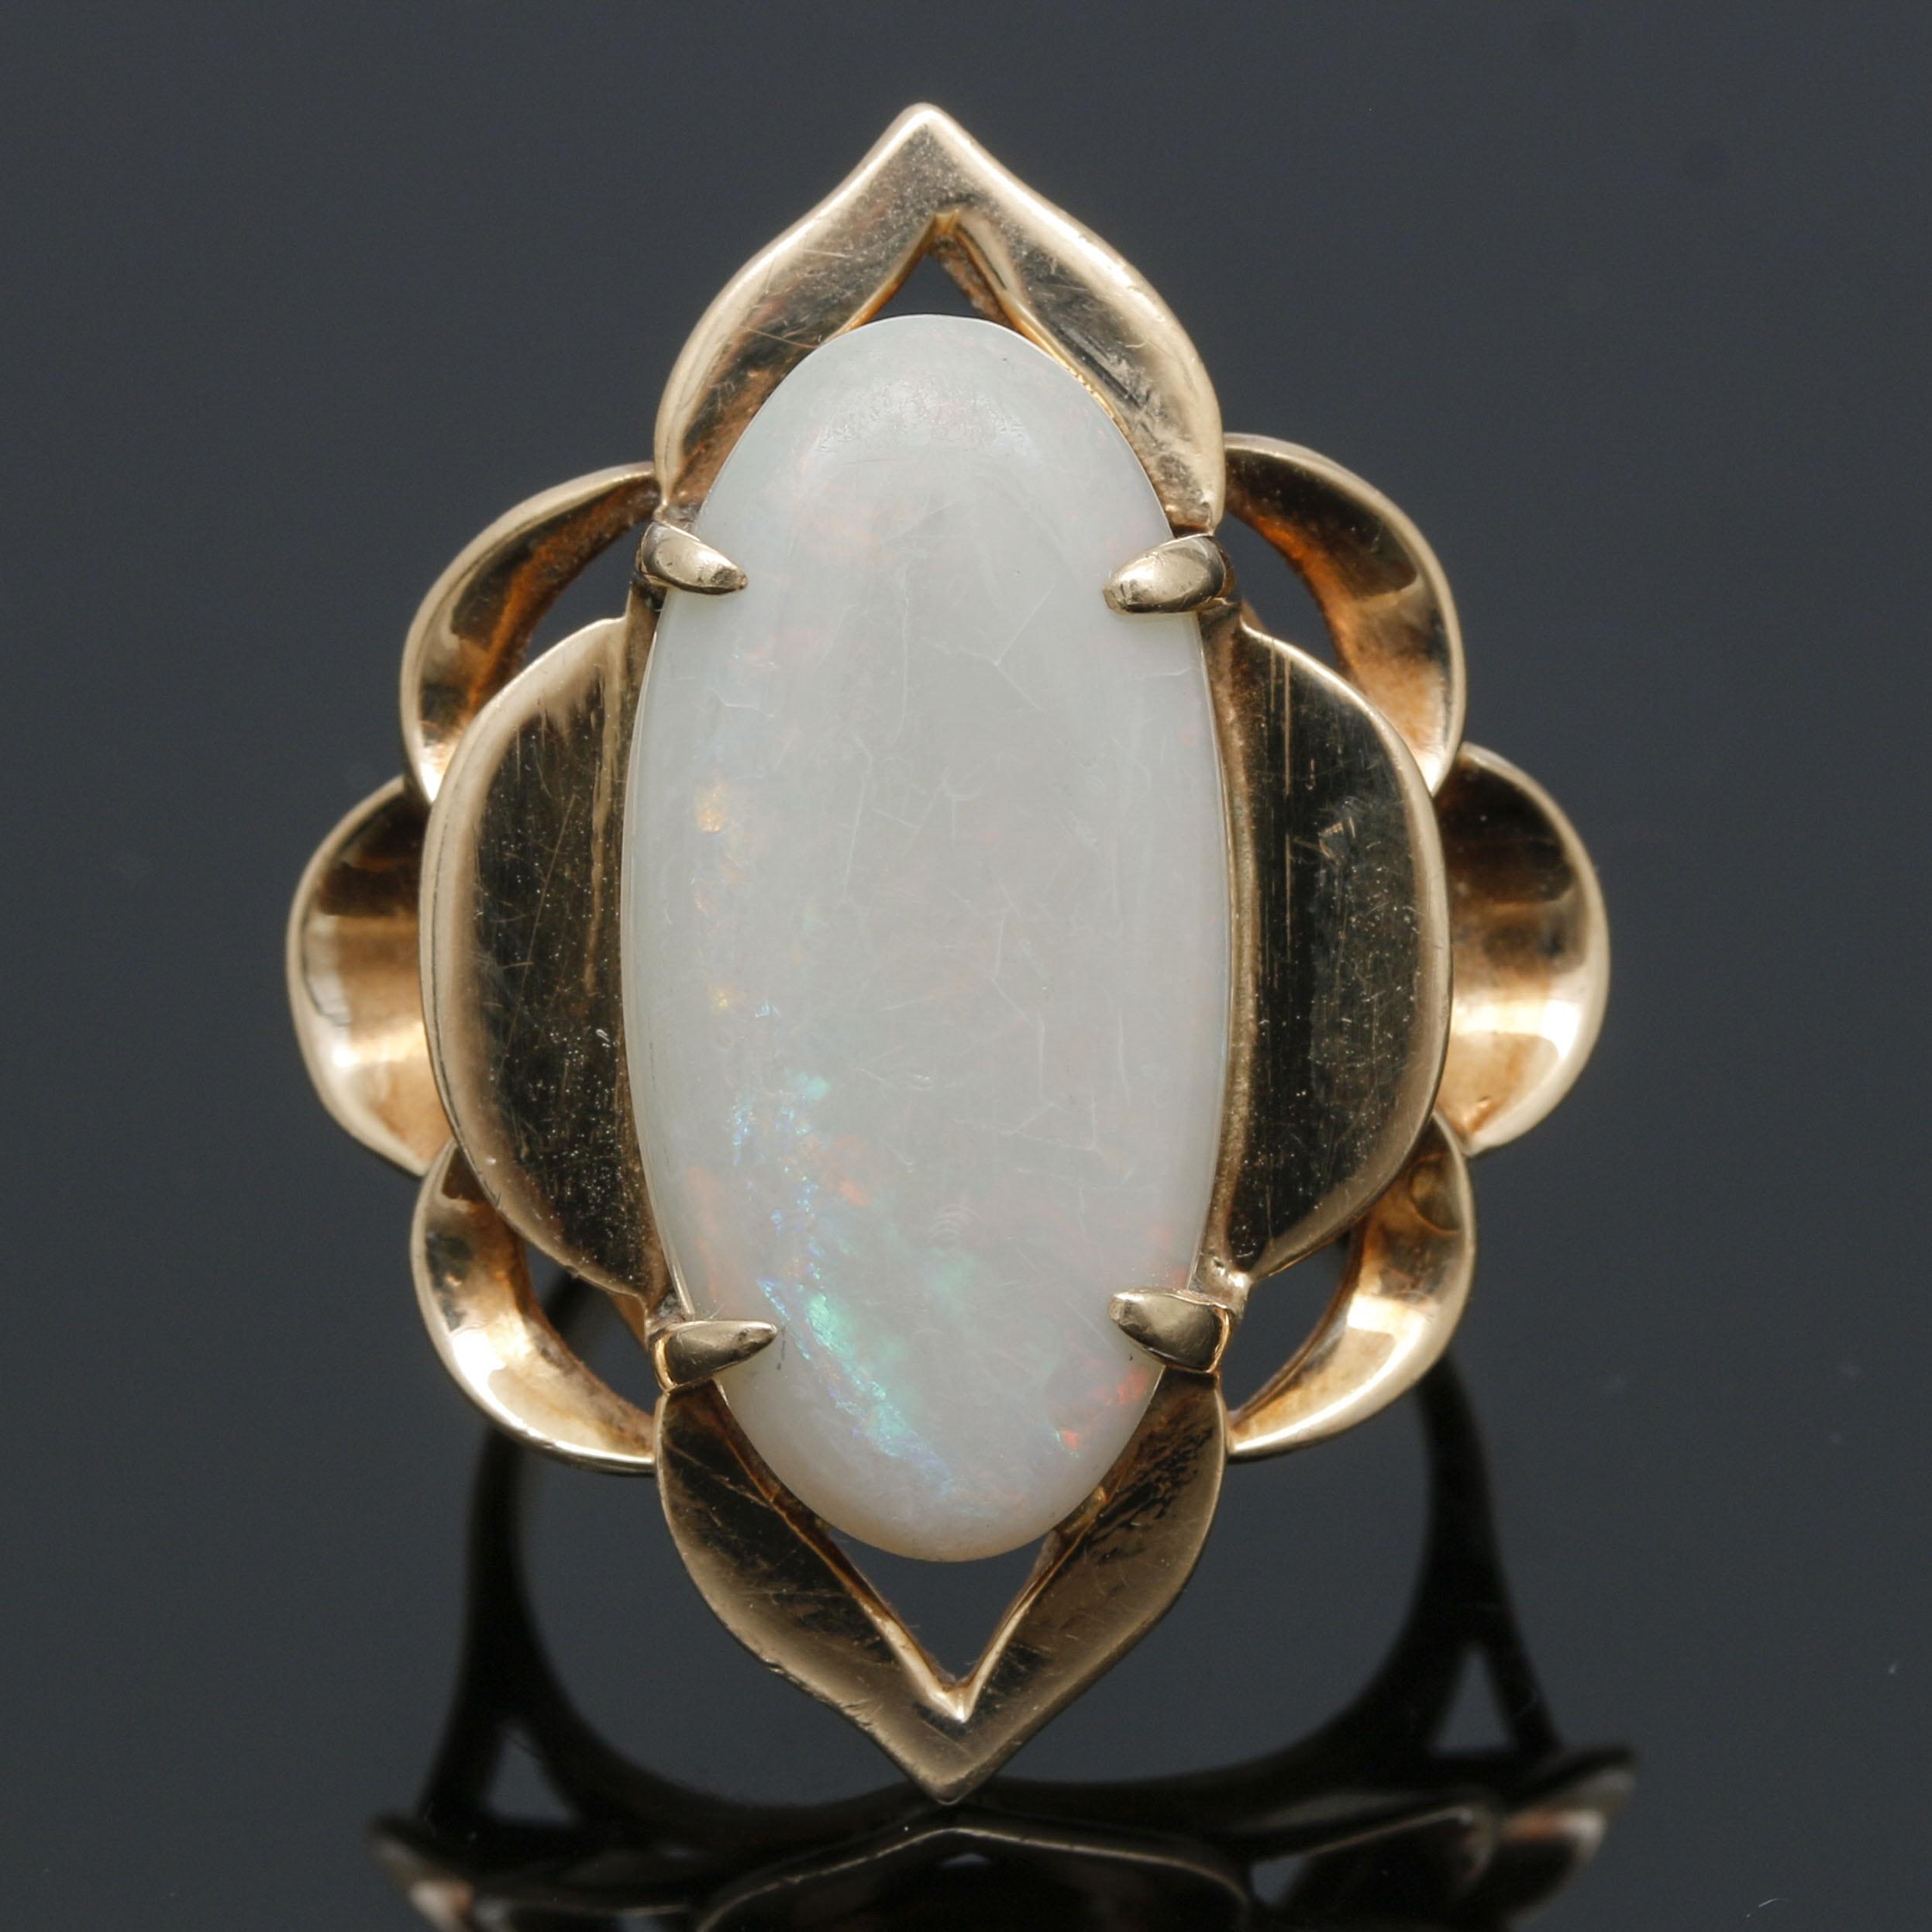 14K Yellow Gold Opal Floral Motif Ring